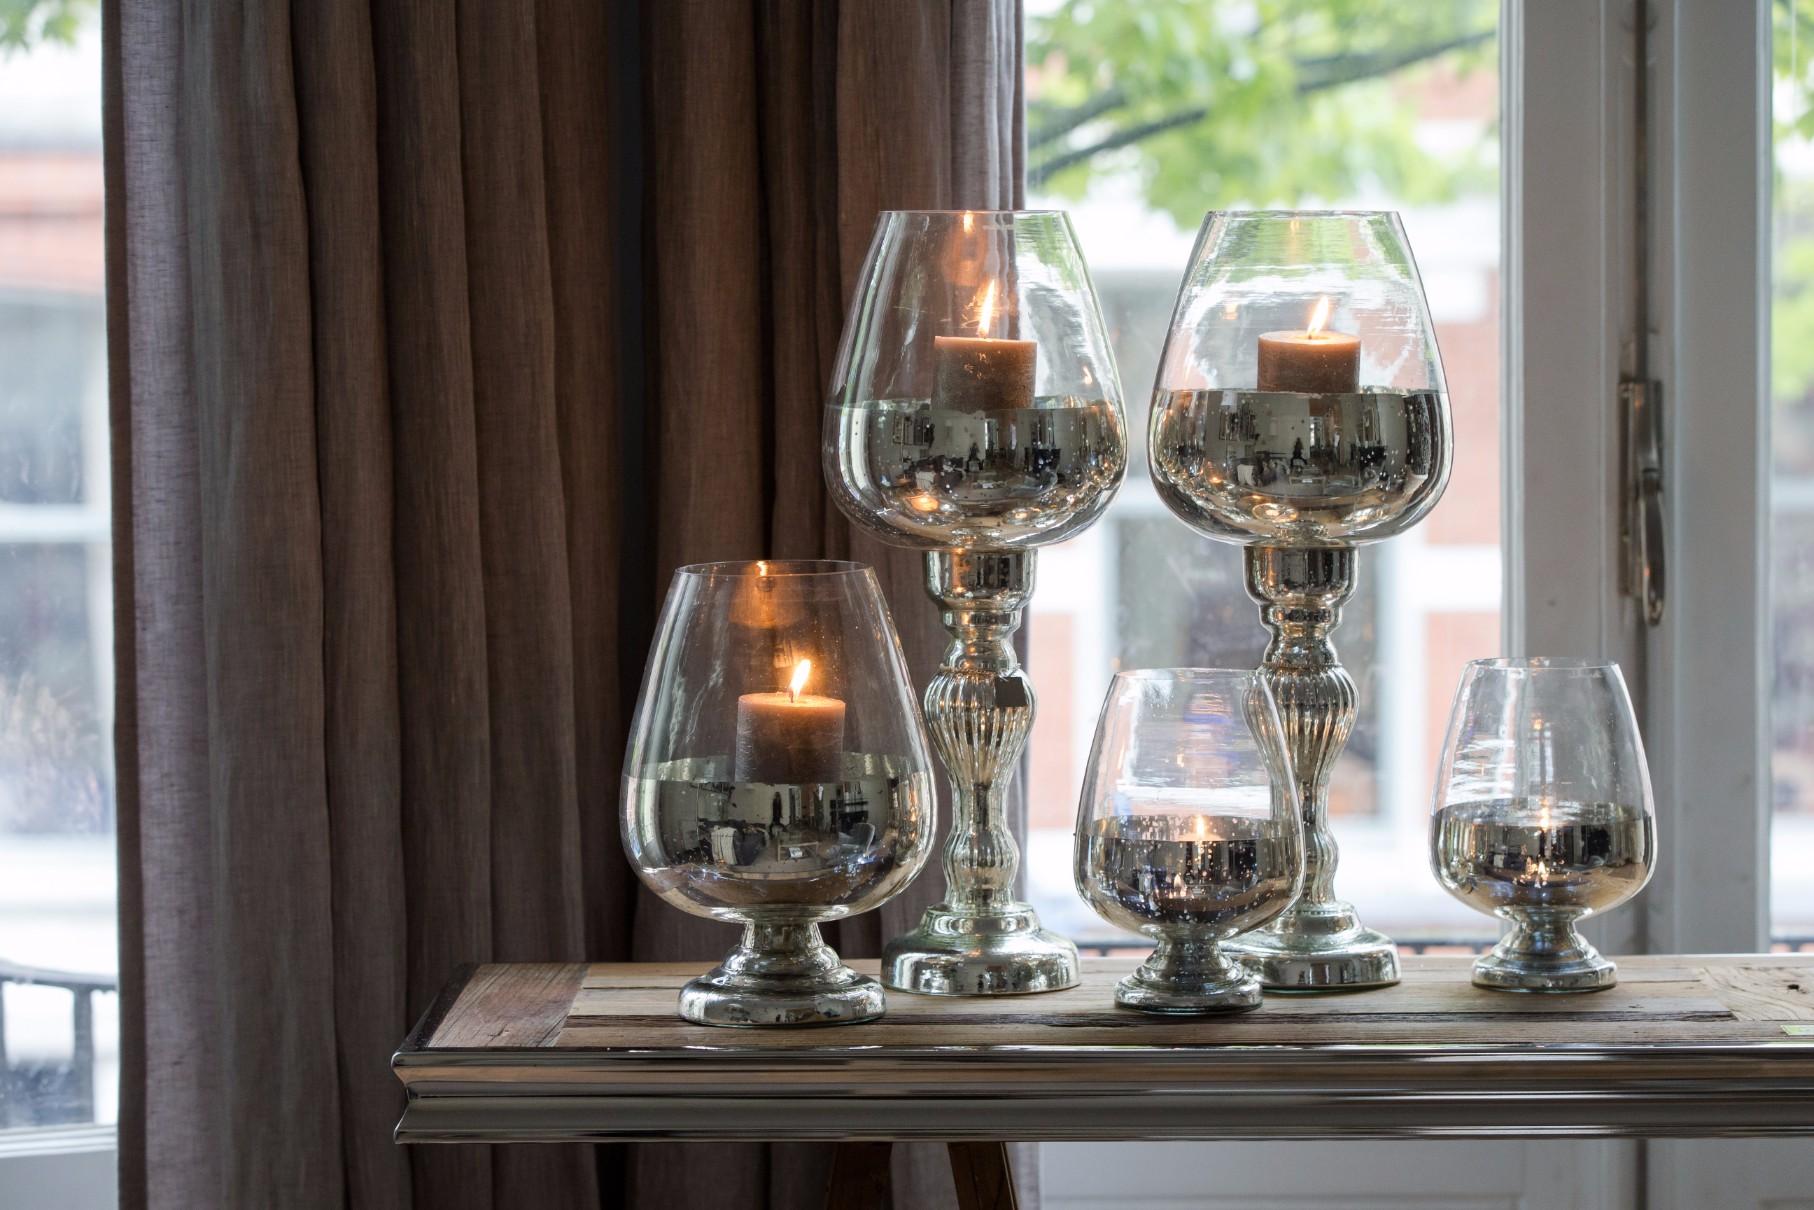 Rivièra Maison herfstcollectie: 3 nieuwe stijlthema\'s - Christmaholic.nl